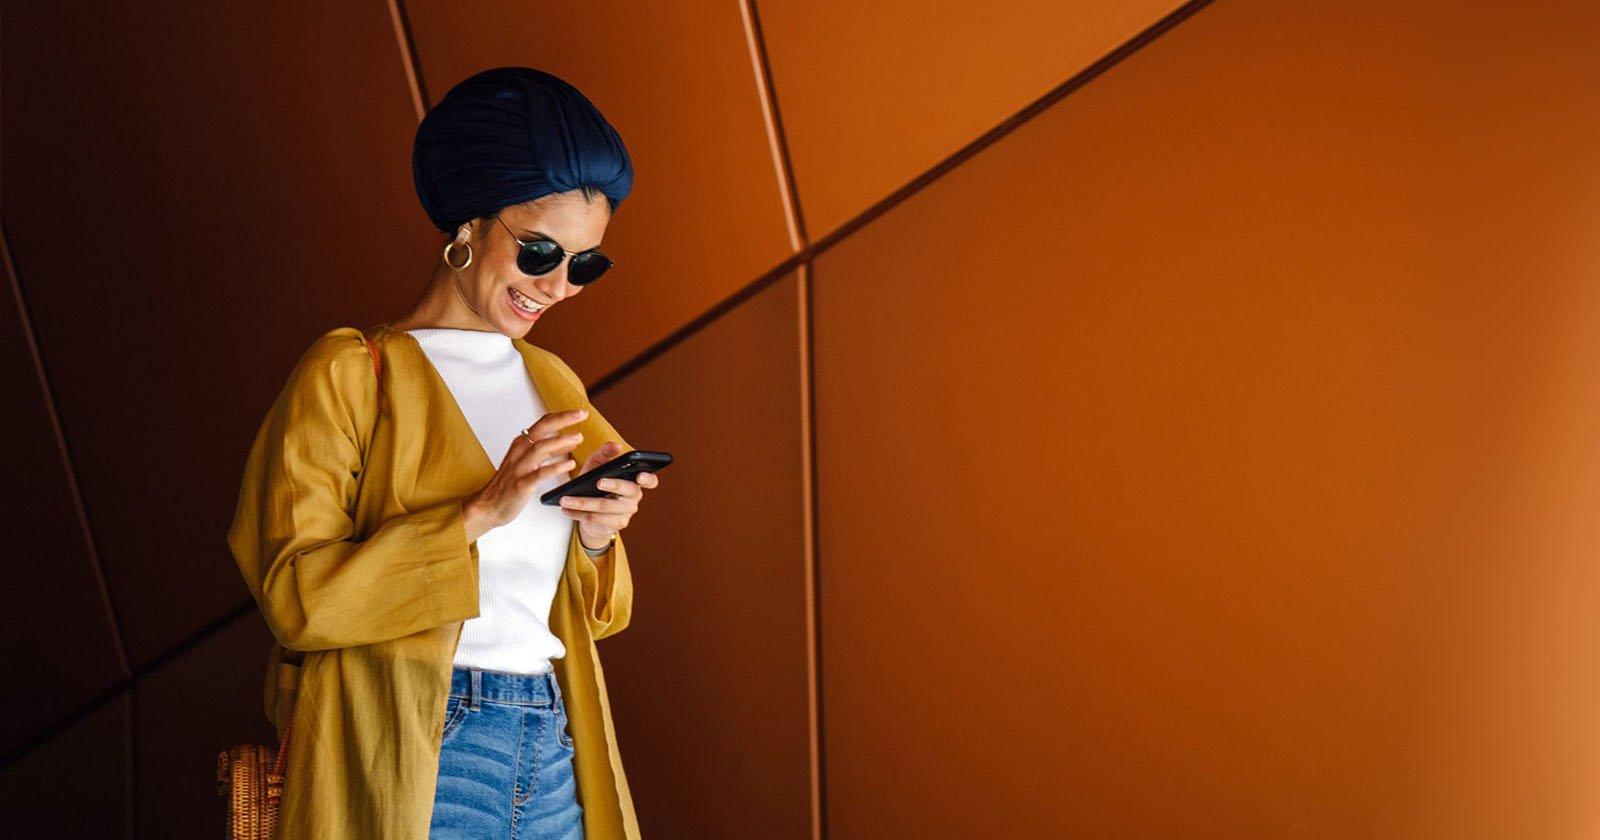 5 Marketing Tactics Every Photographer Needs to Know